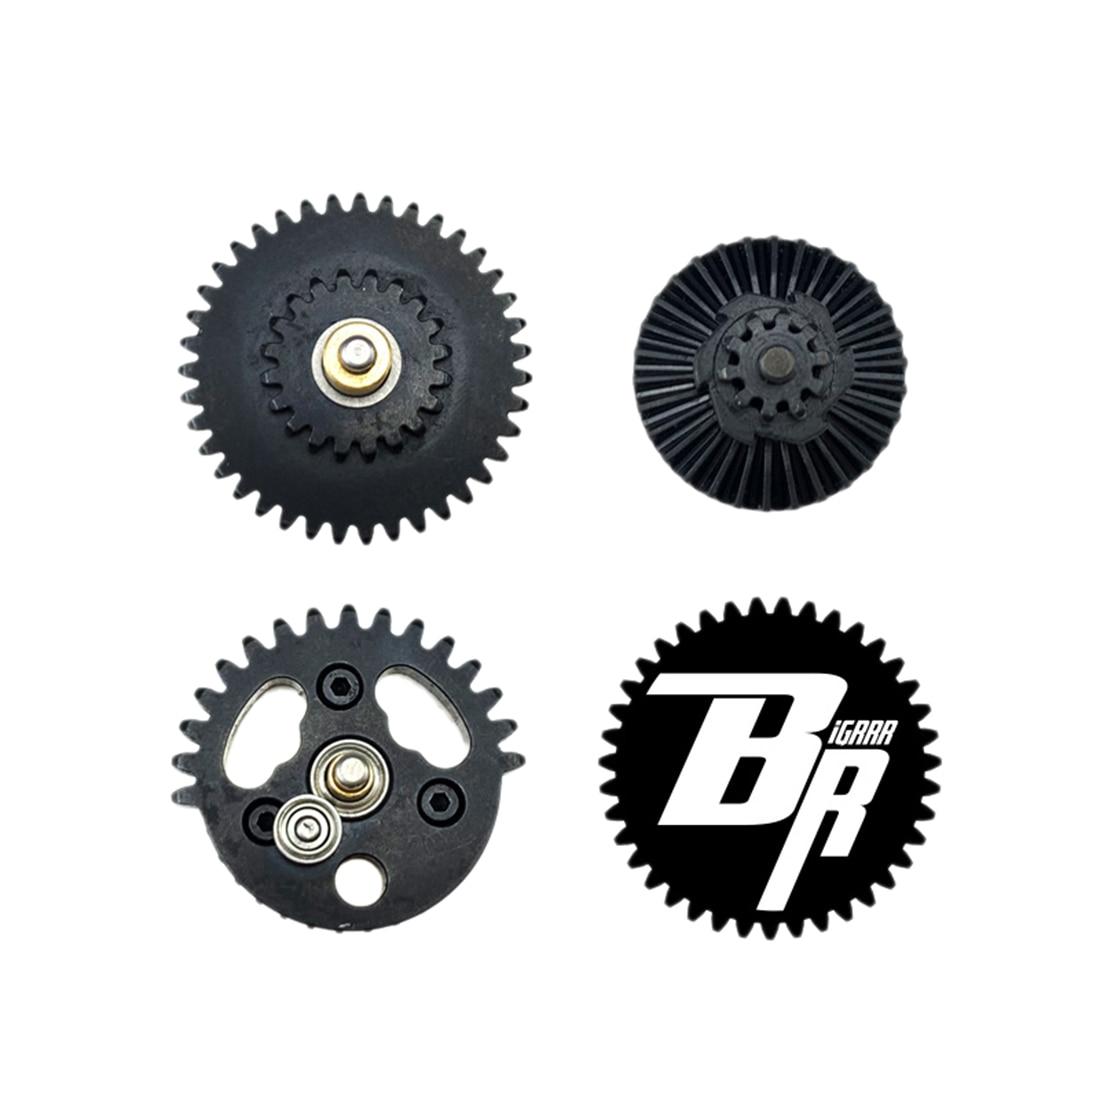 BIGRRR 18 1 16 1 13 1 Standard CNC Alloy Steel Gear for No 2 Gearbox